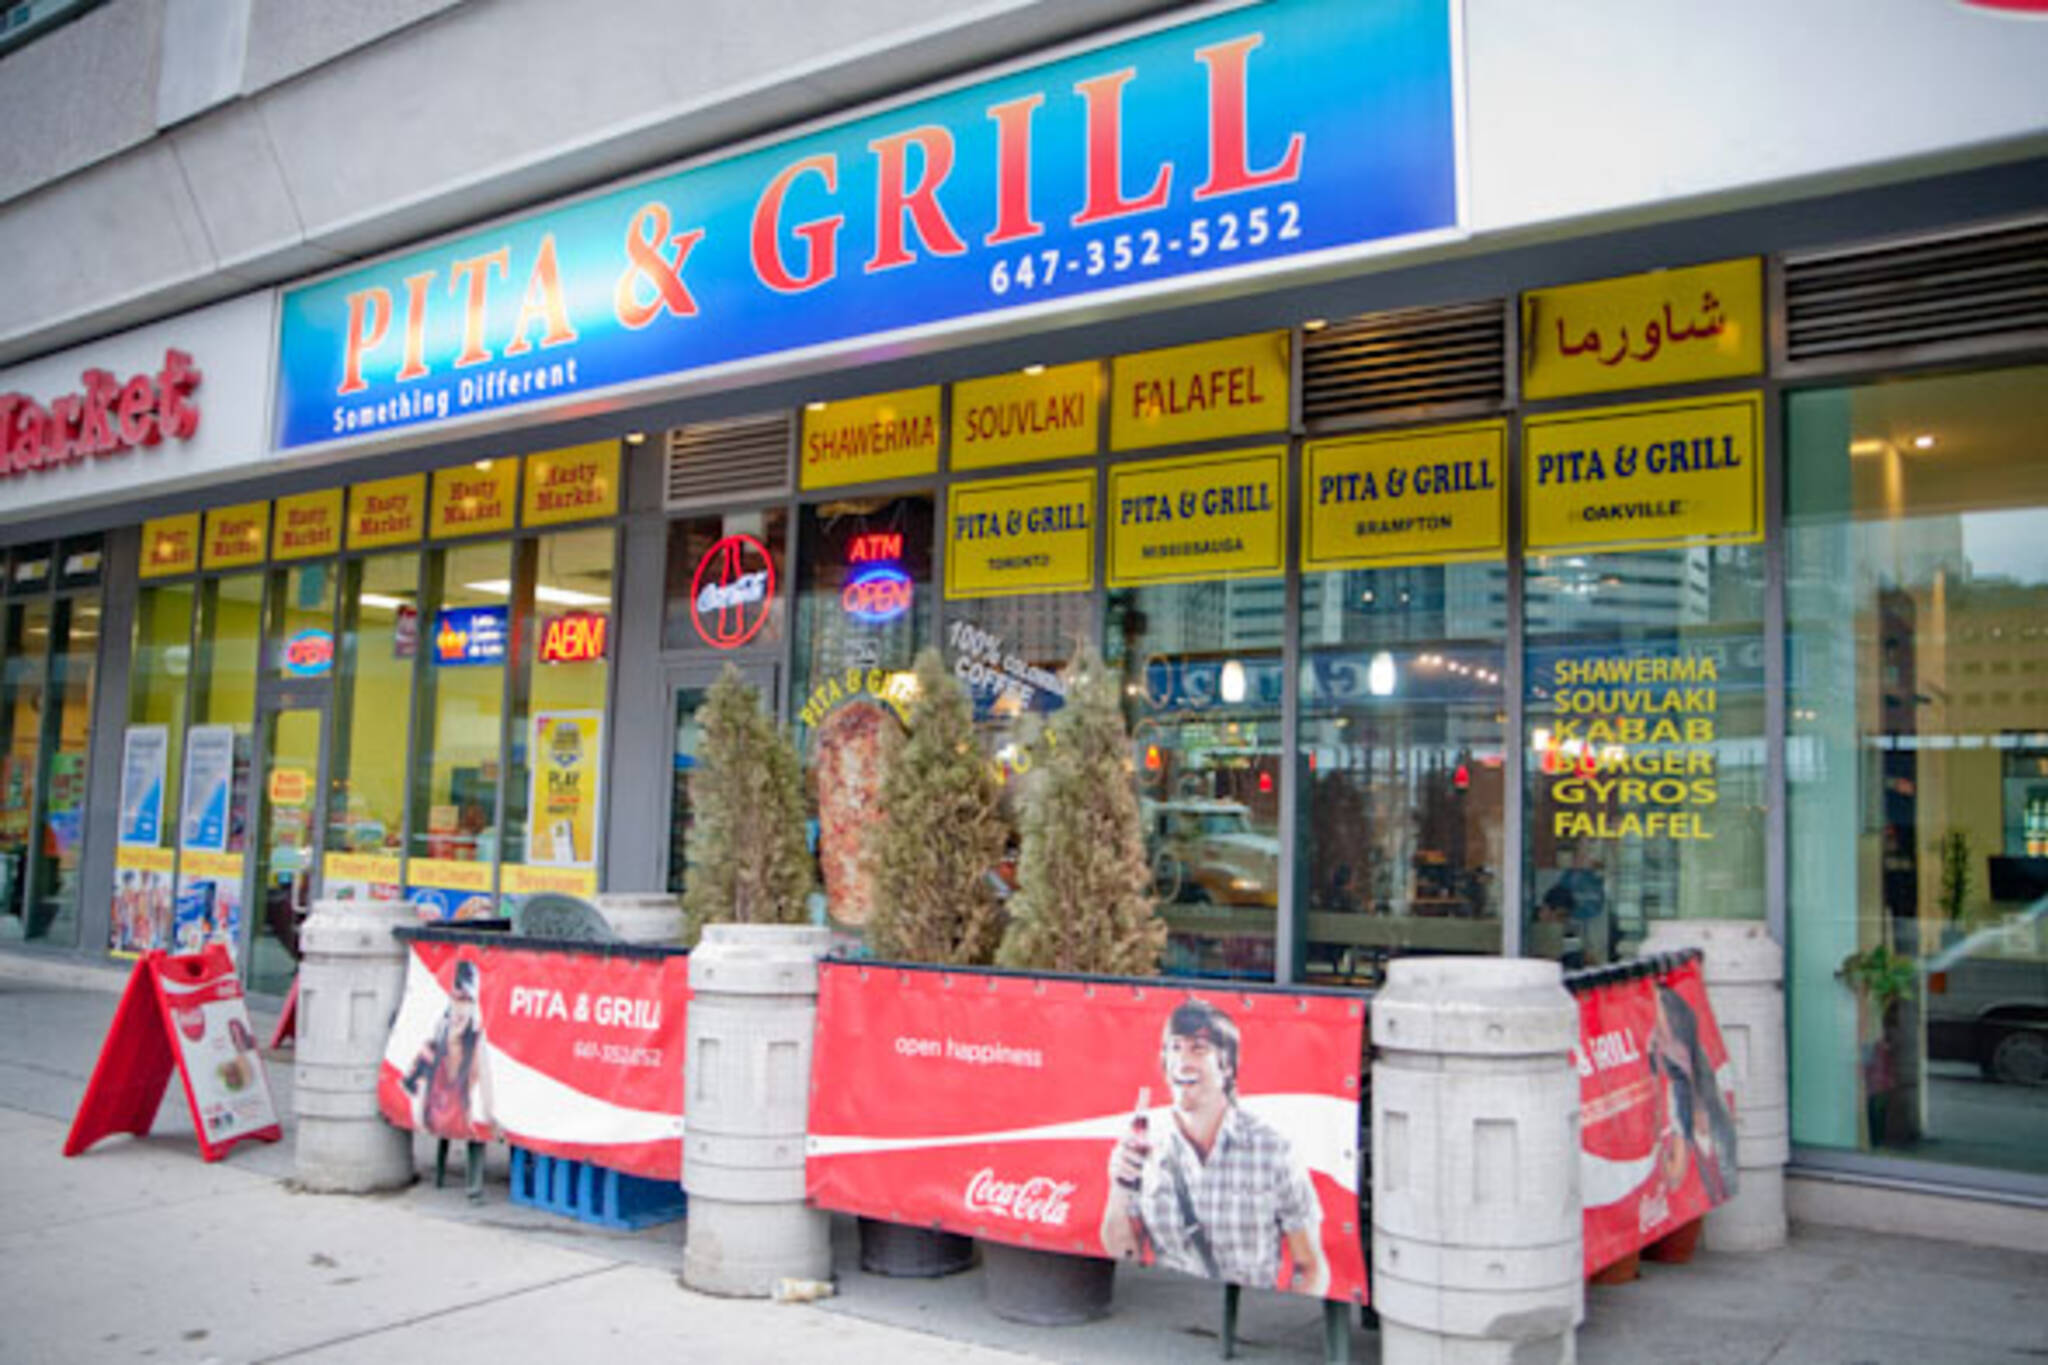 pita and grill toronto